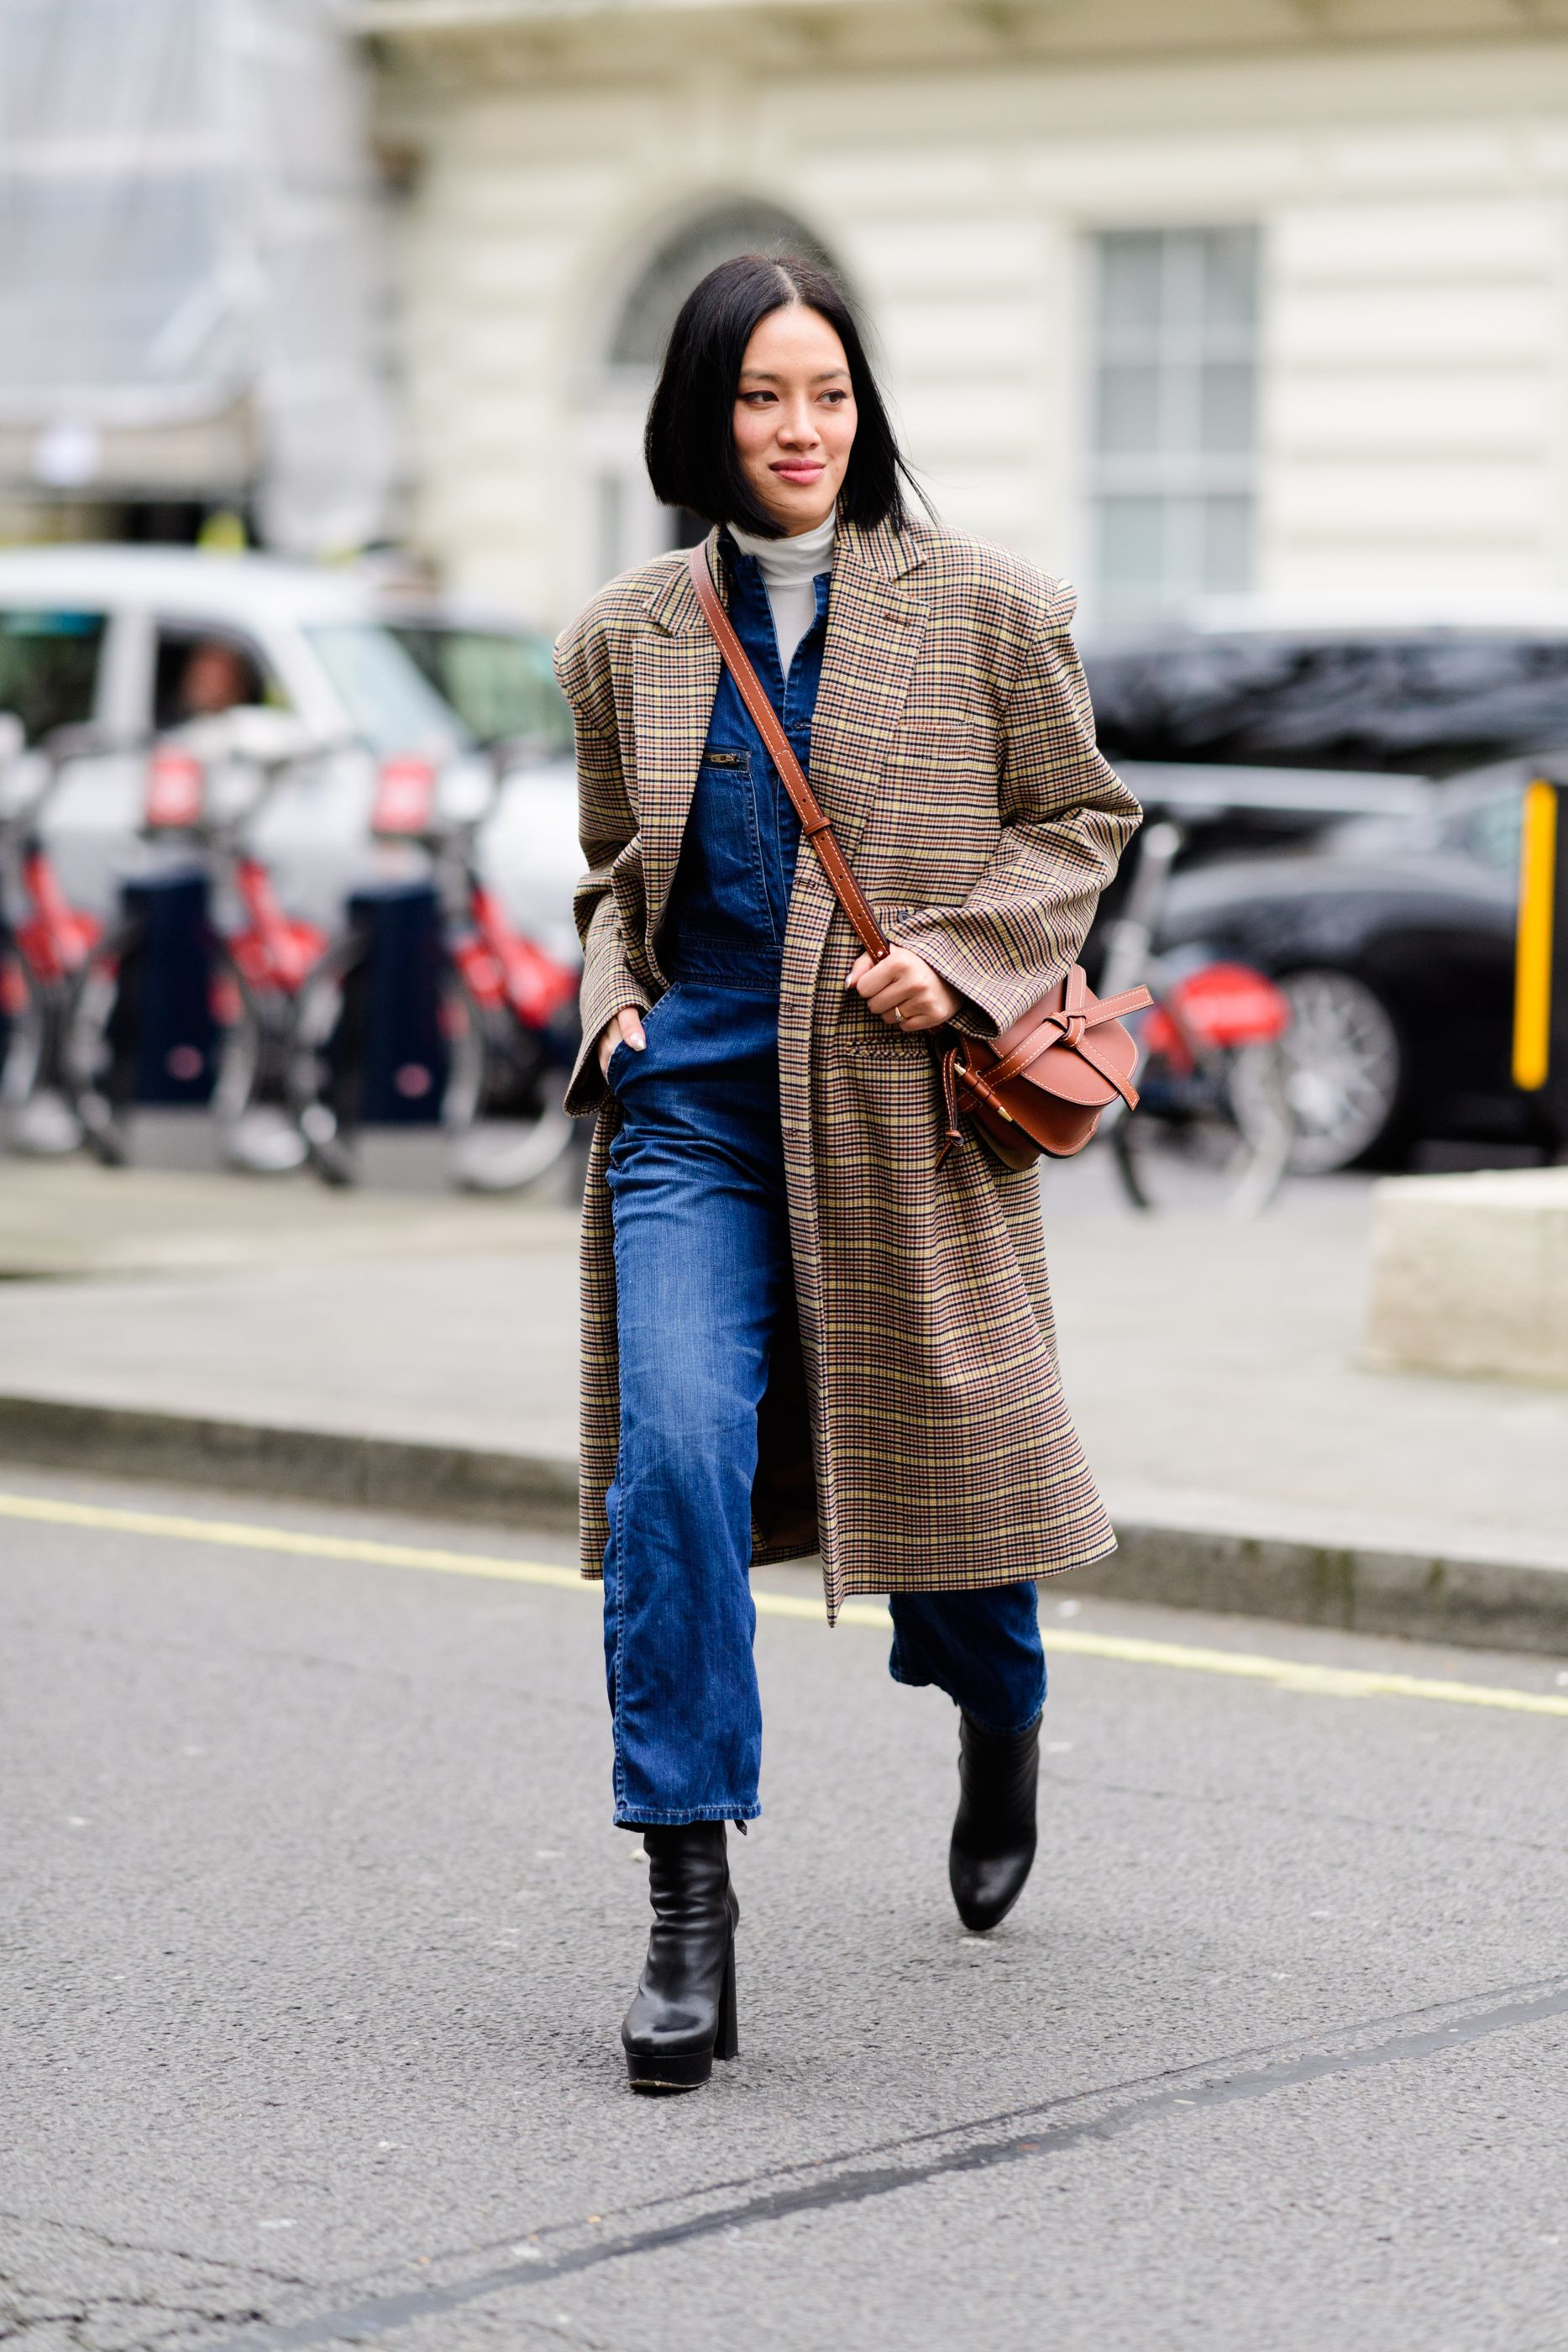 Street london style fotos